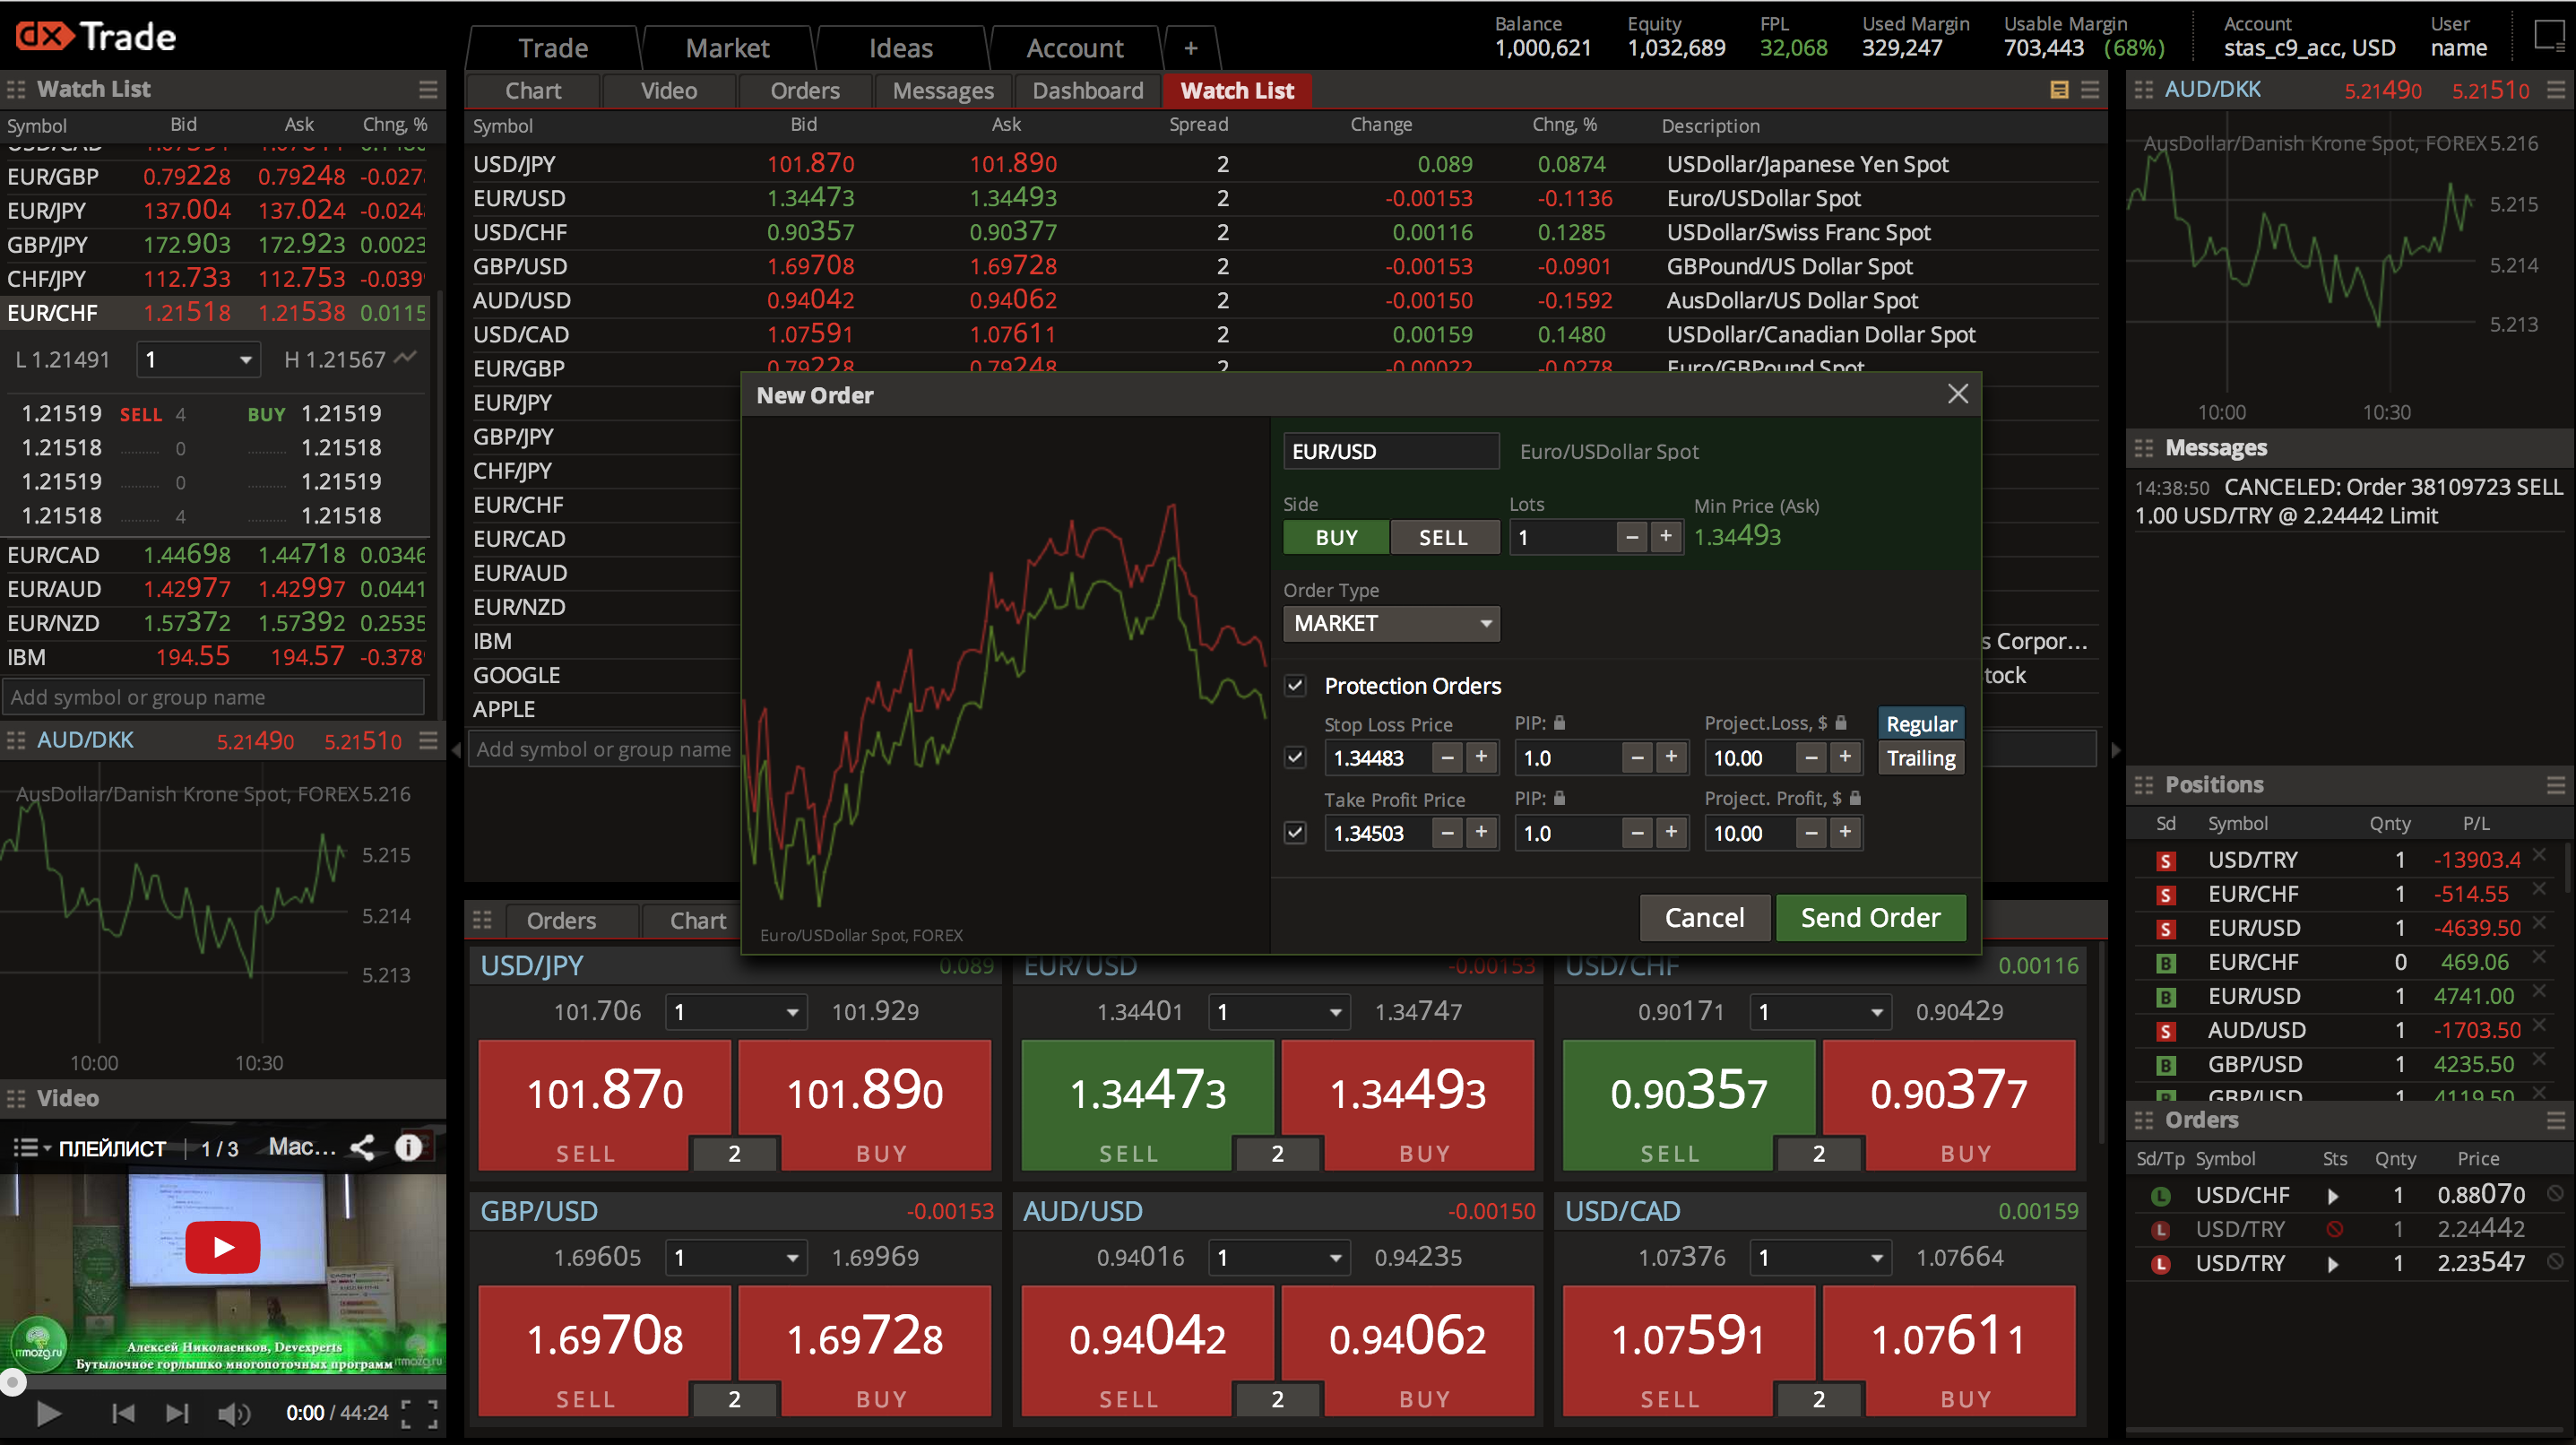 Sneak Peek: Devexperts to Launch a Web-Based HTML5 Platform | Finance Magnates